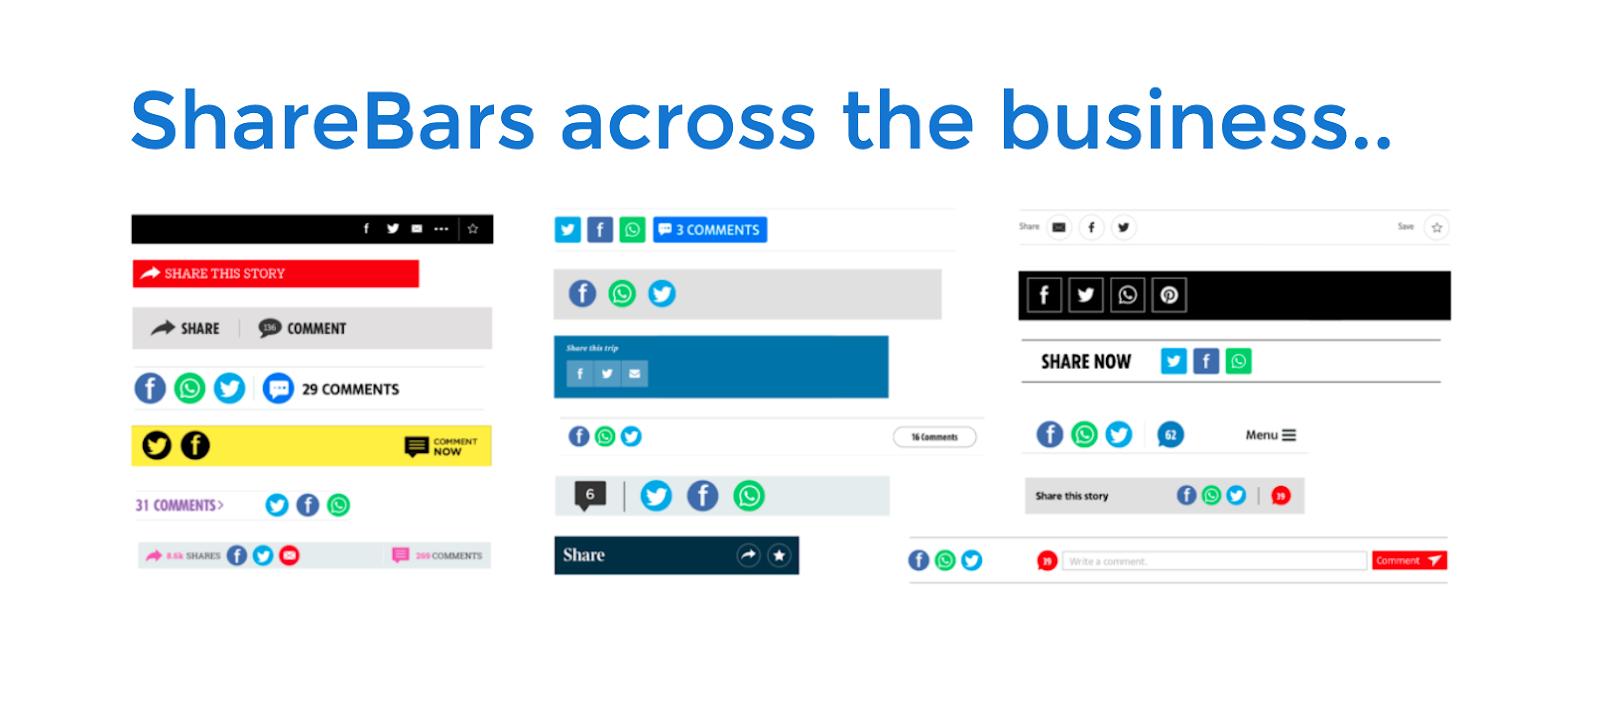 sharebars